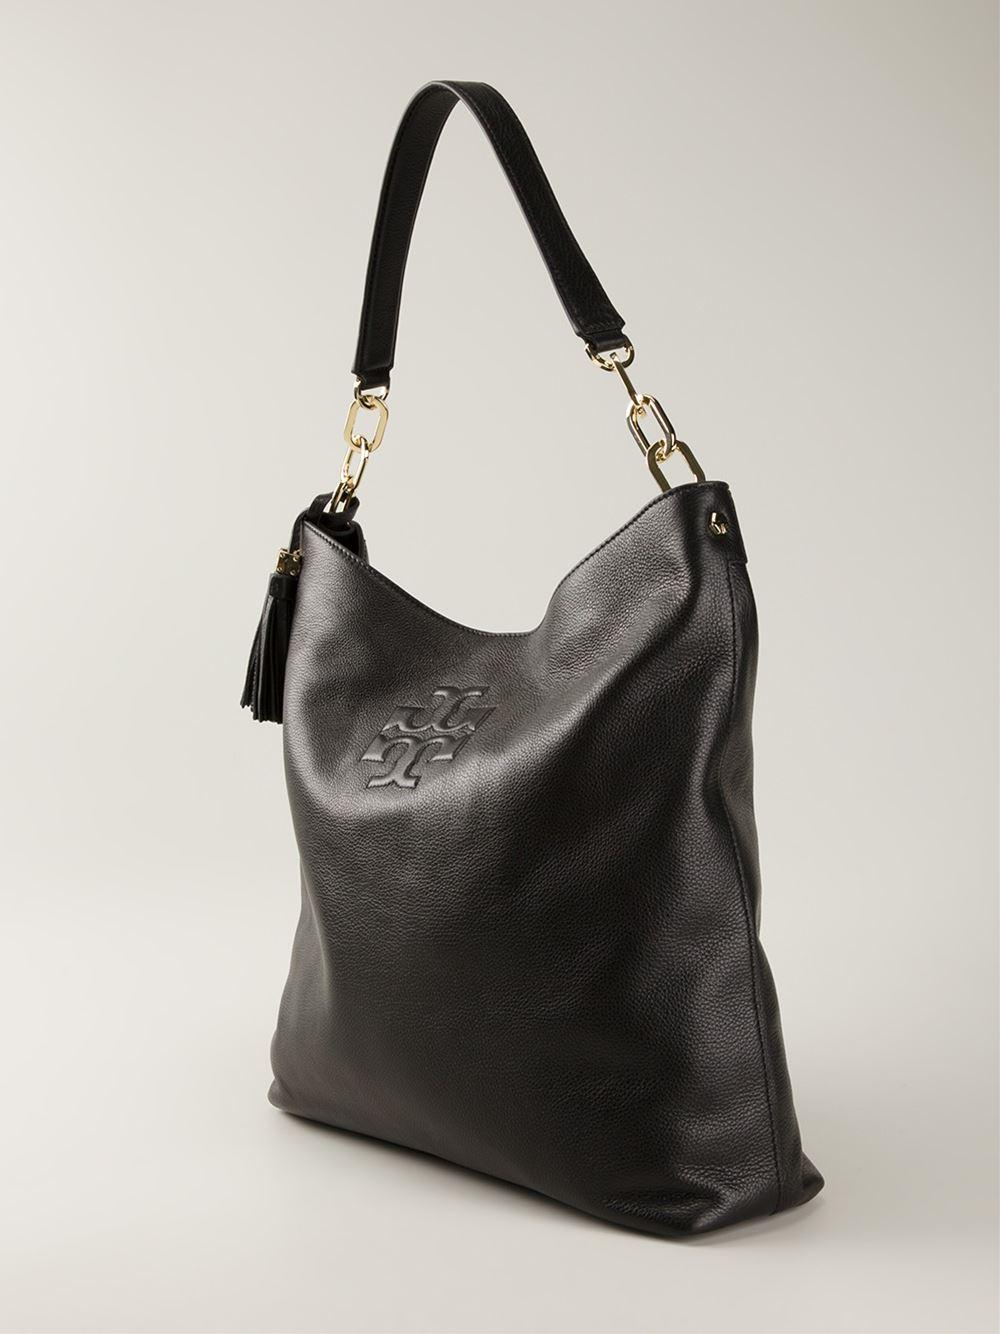 1456c57f0efb Lyst - Tory Burch  Thea Hobo  Bag in Black